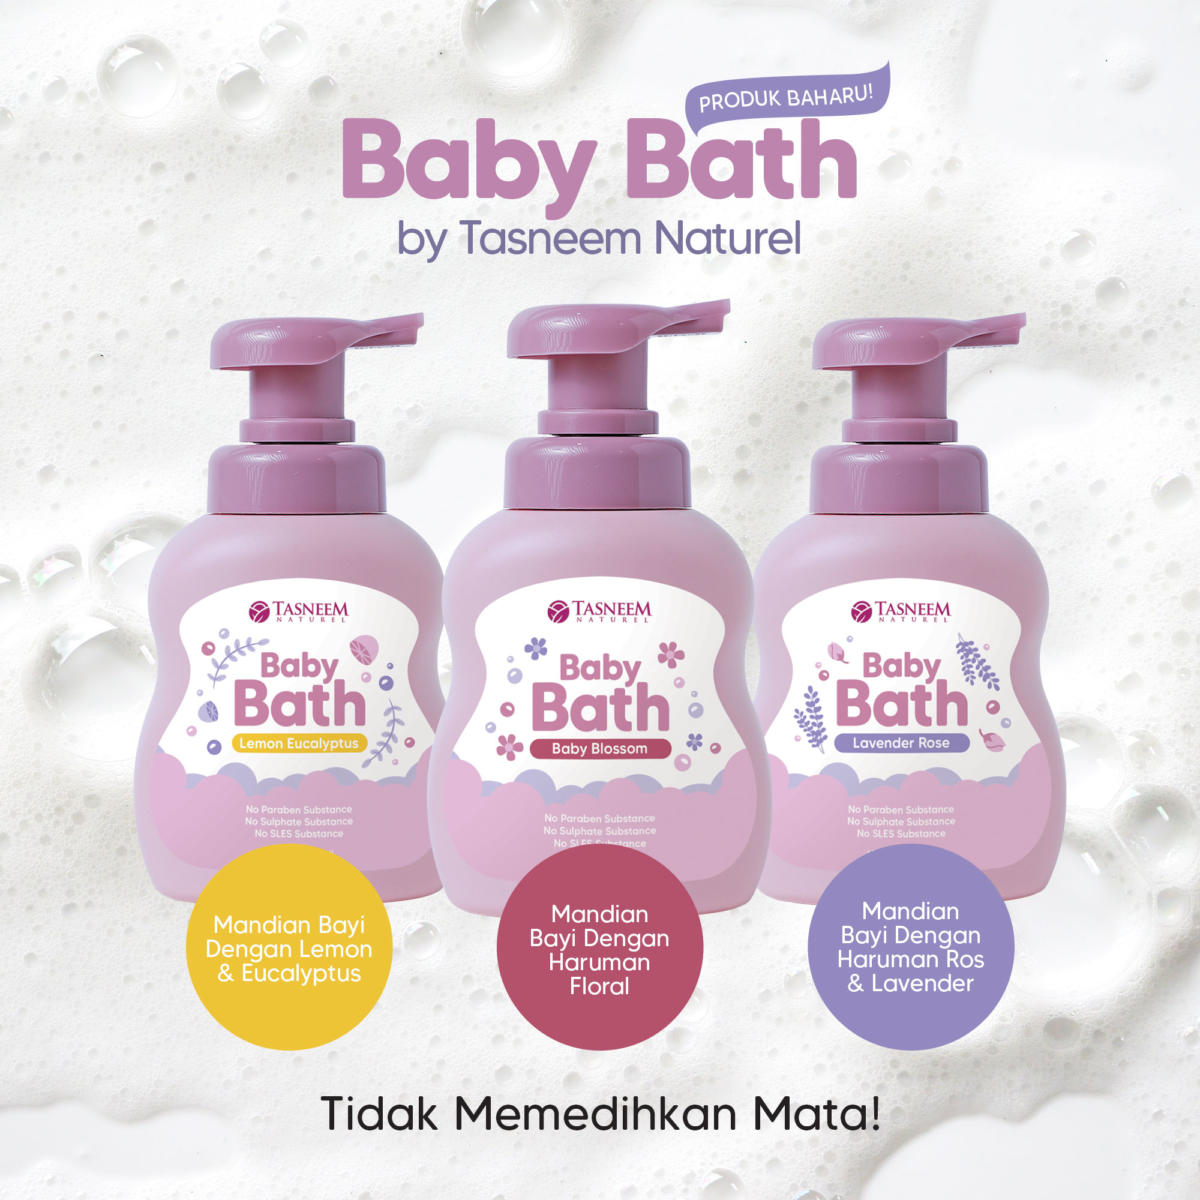 Tasneem Baby Bath